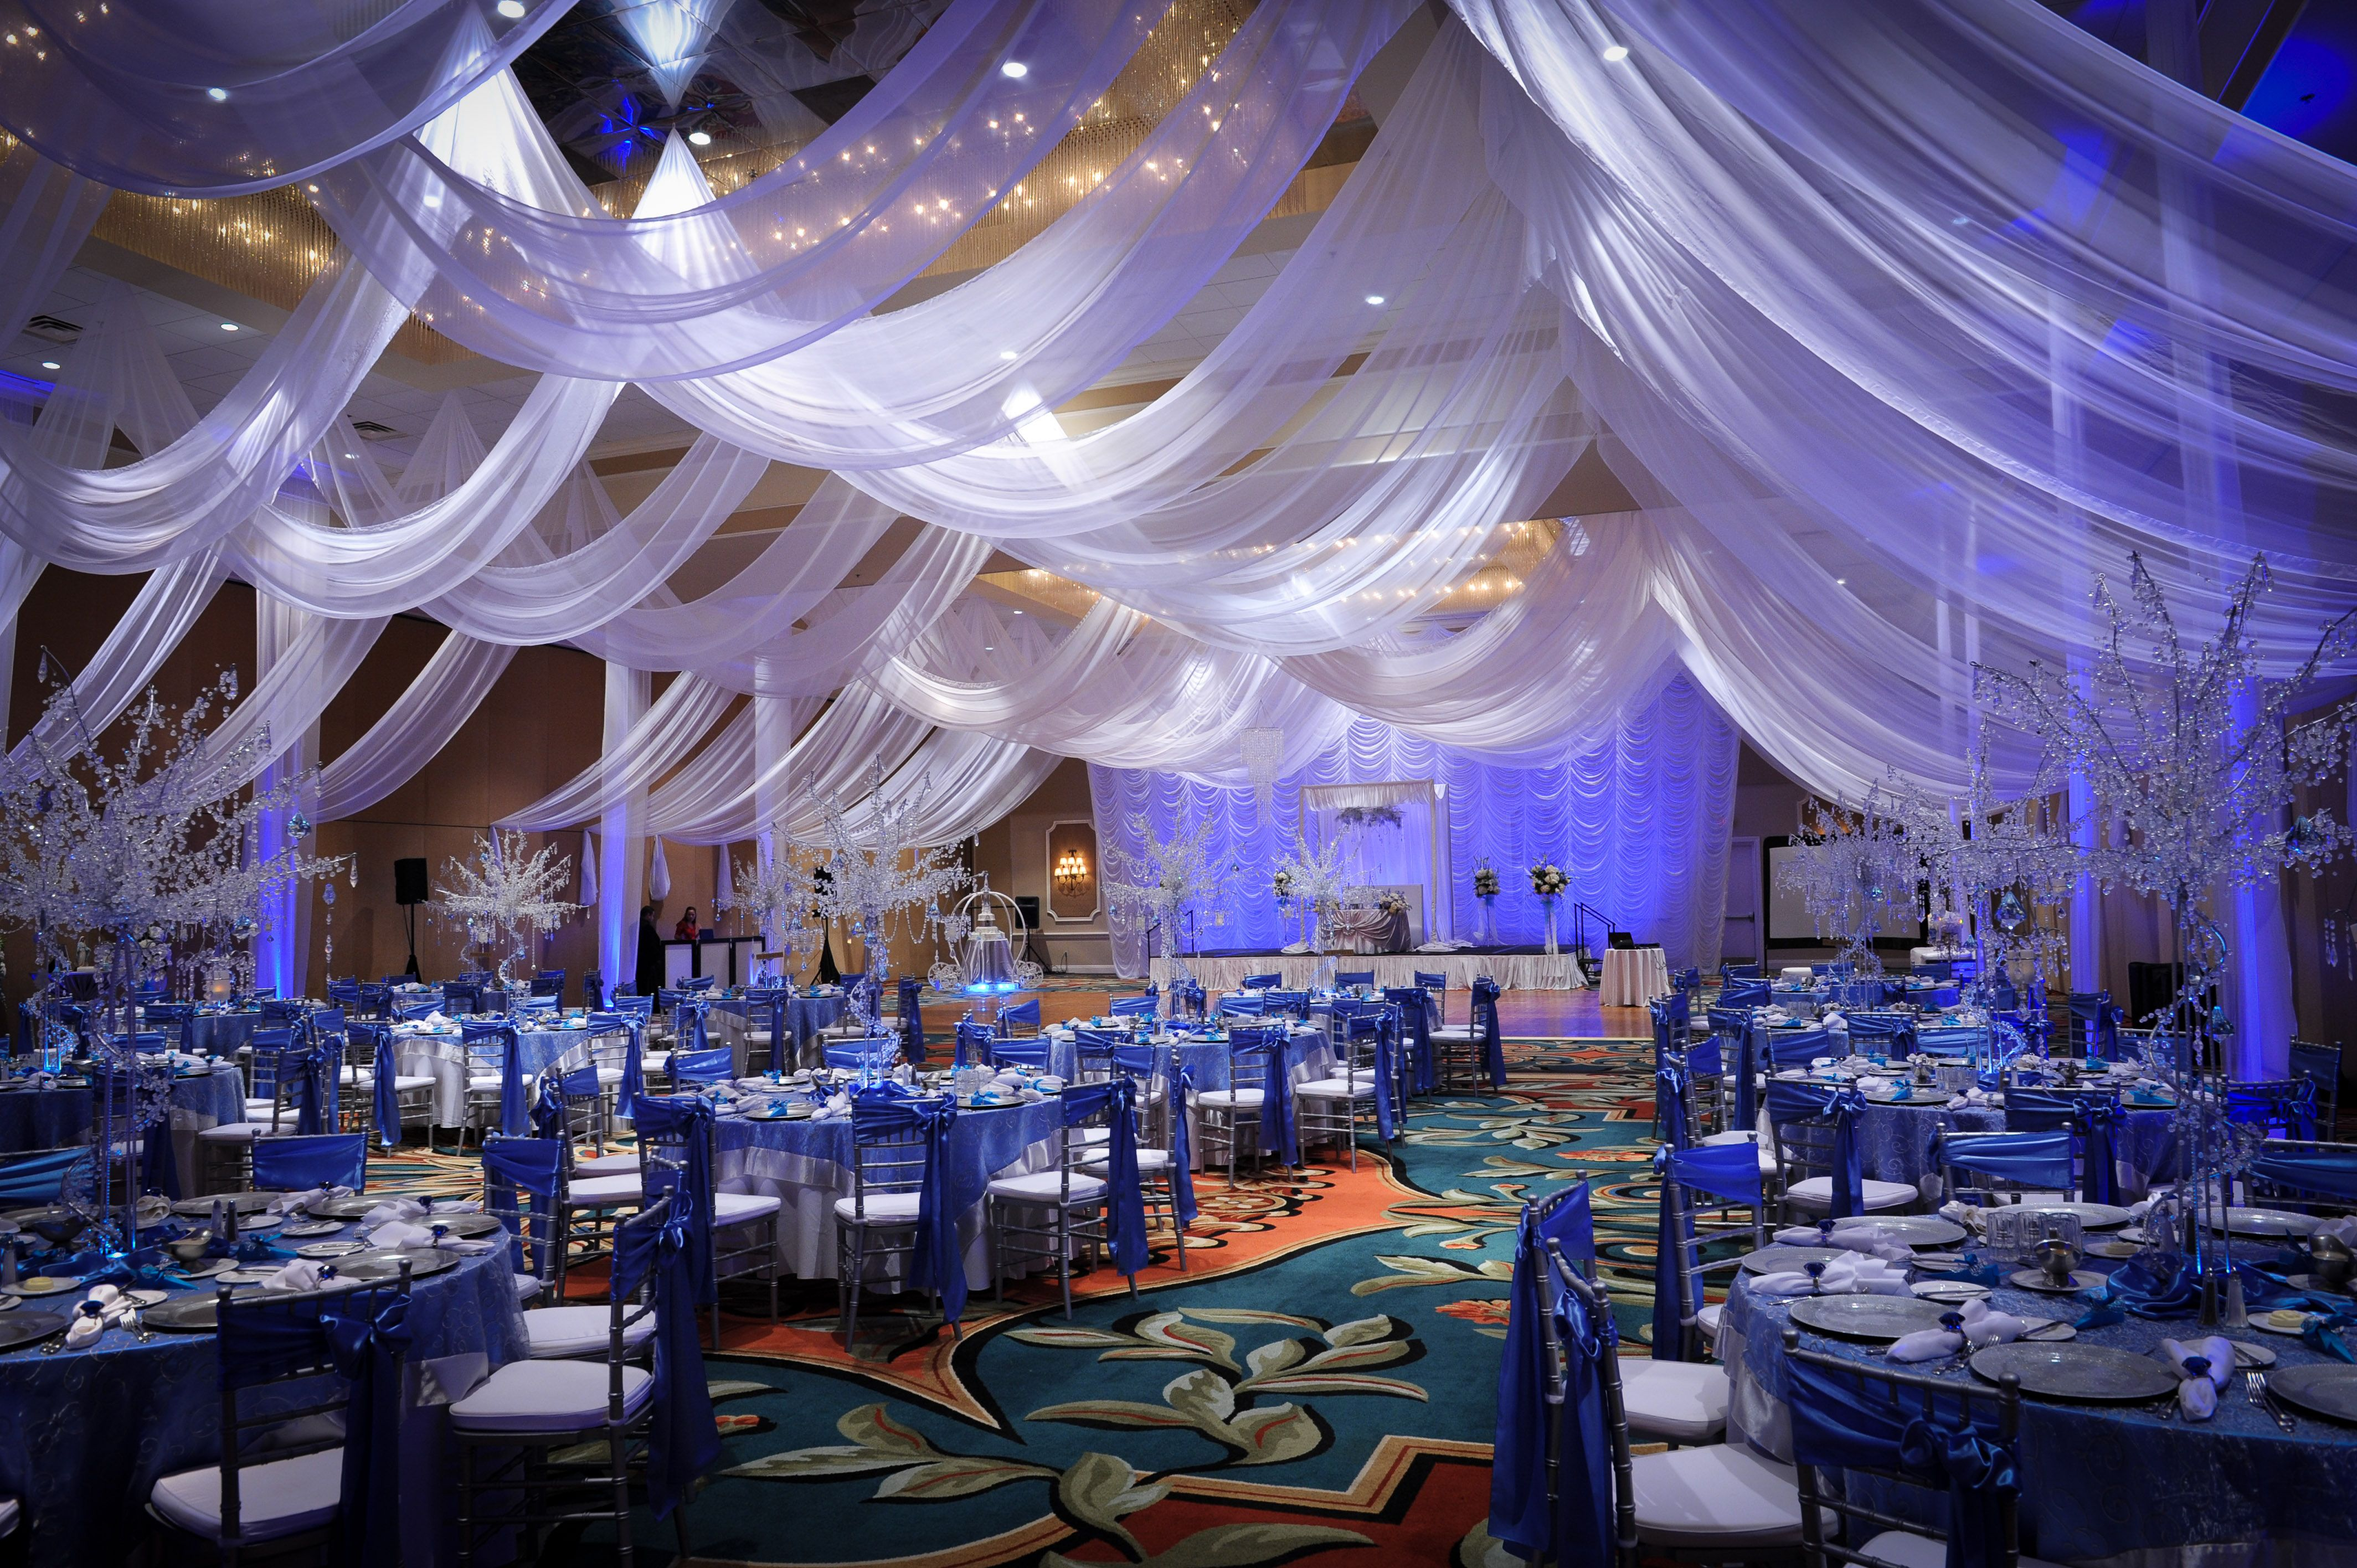 Blue wedding decor ideas  Pin by Brindille Banquet Hall on Decorations  Pinterest  Wedding